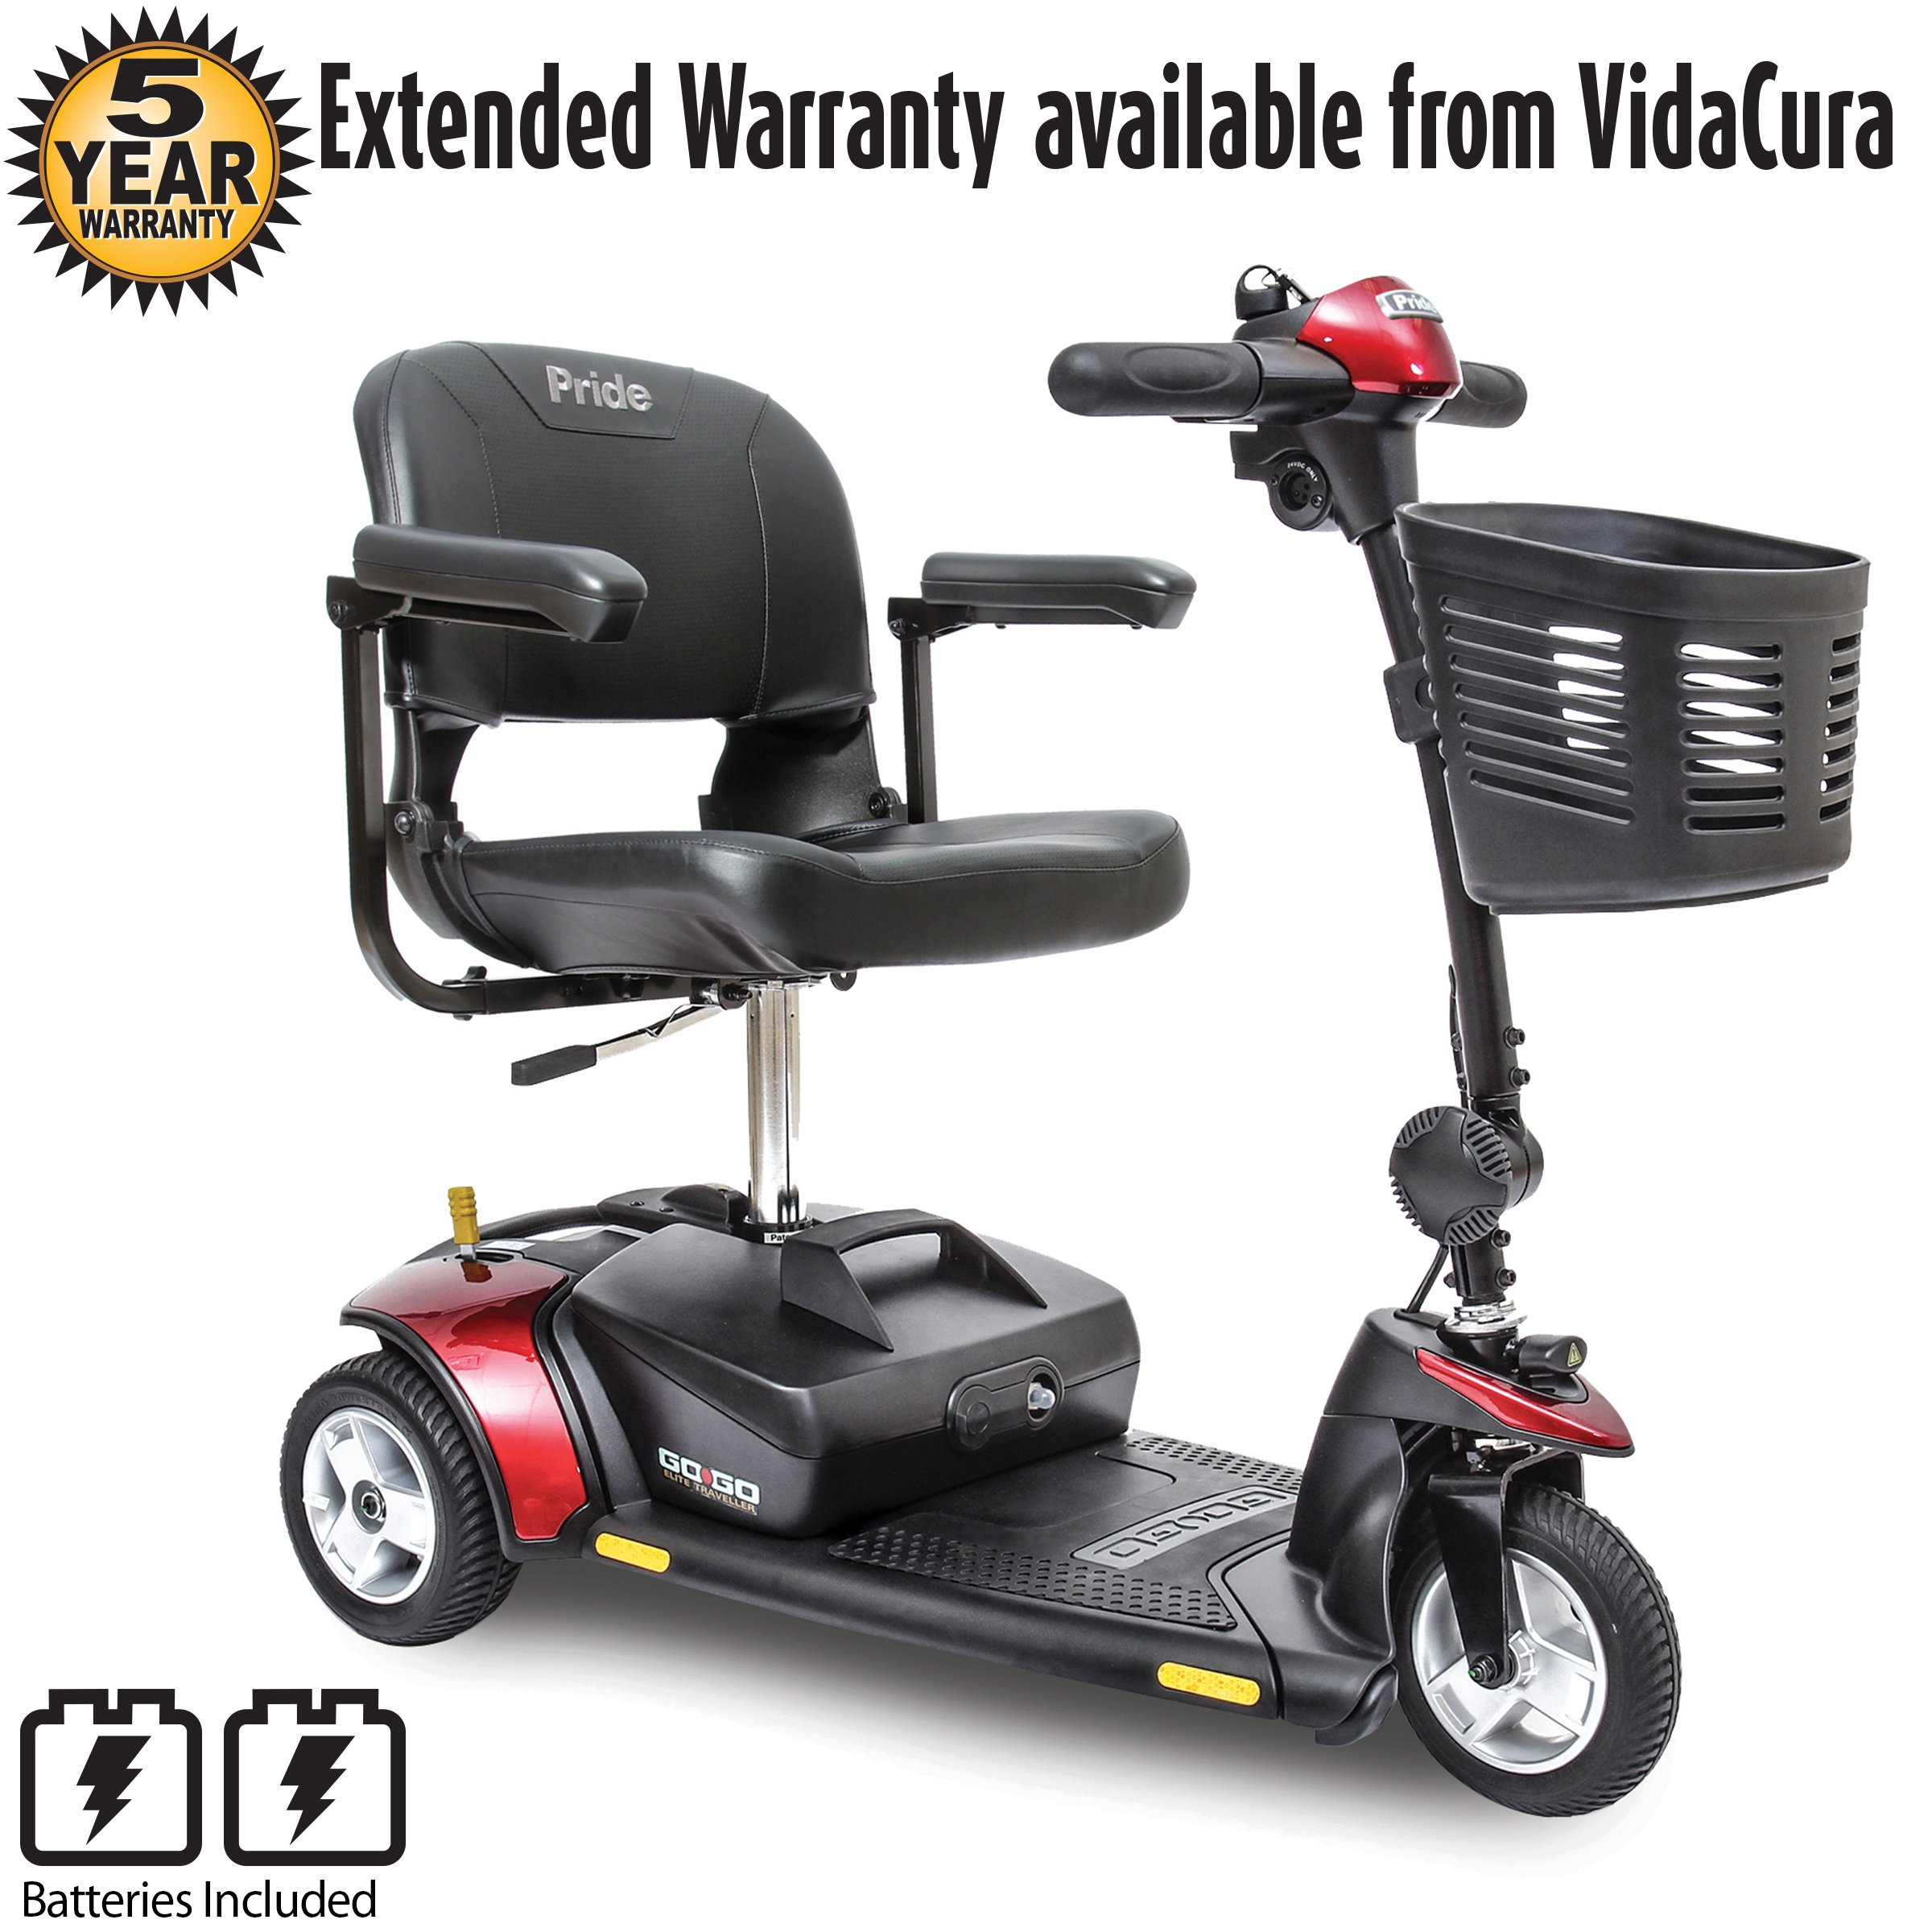 Pride Go-Go Elite Traveller 3-Wheel Scooter Including 5 Year Ext. Warr.